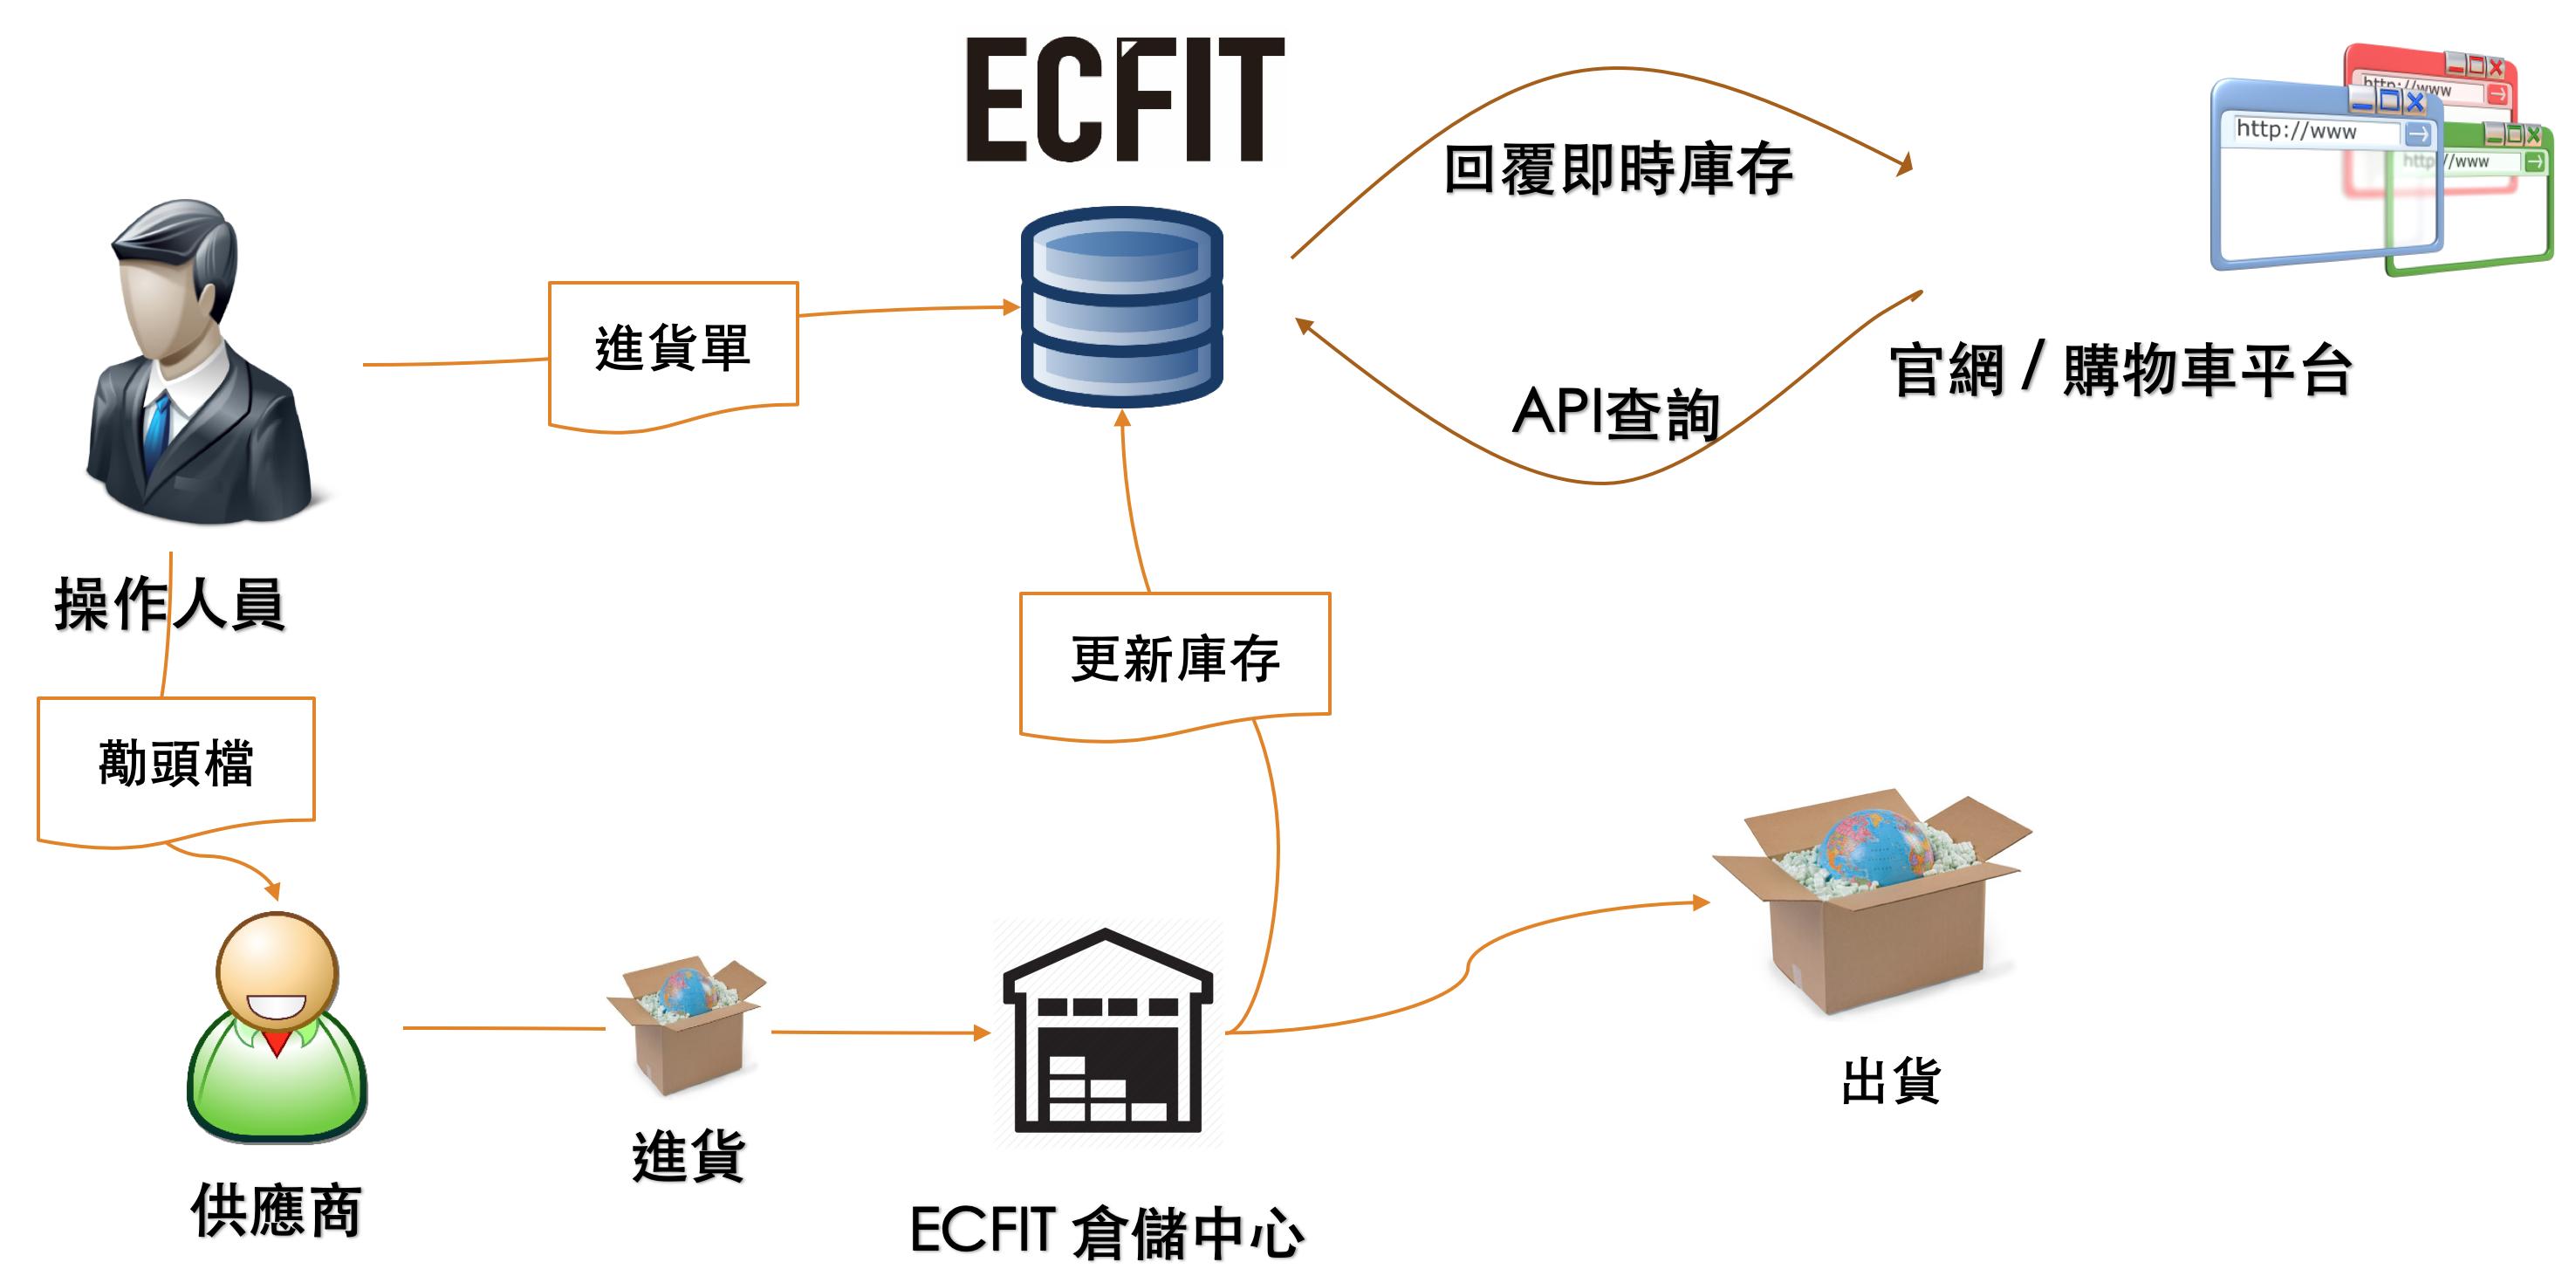 ECFIT 線上庫存管理